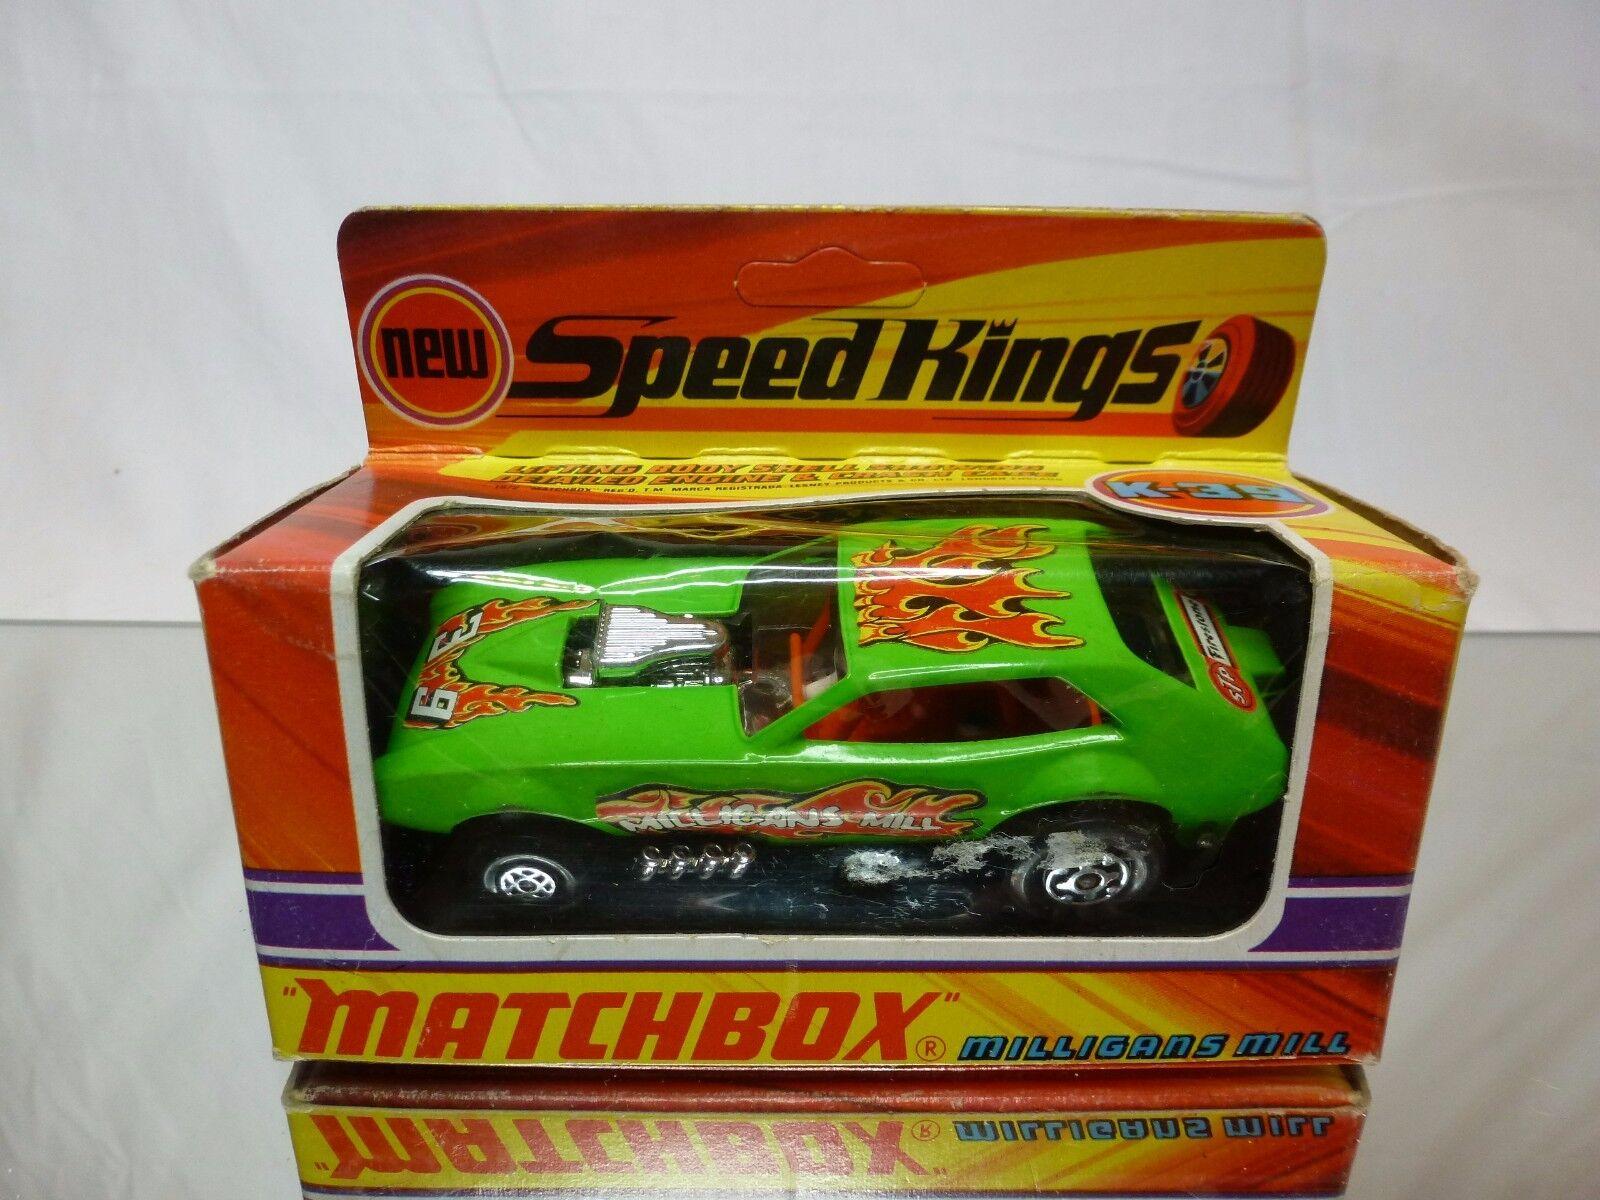 tienda MATCHBOX K-39 K39 MILLIGANS MILL - verde 1 1 1 43 - GOOD CONDITION IN BOX  Felices compras